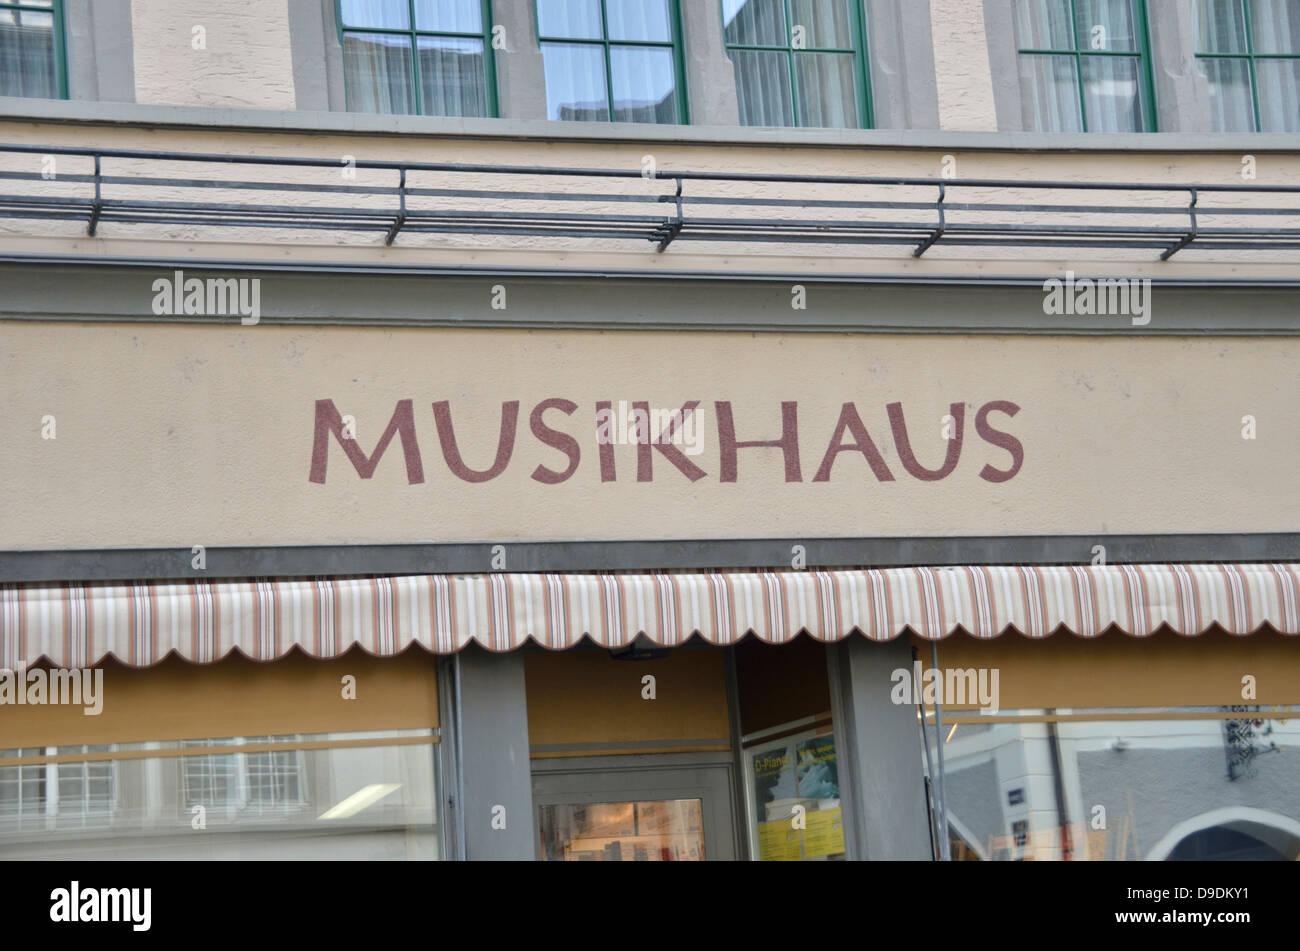 Musikhaus stockfotos musikhaus bilder alamy for Musik hause